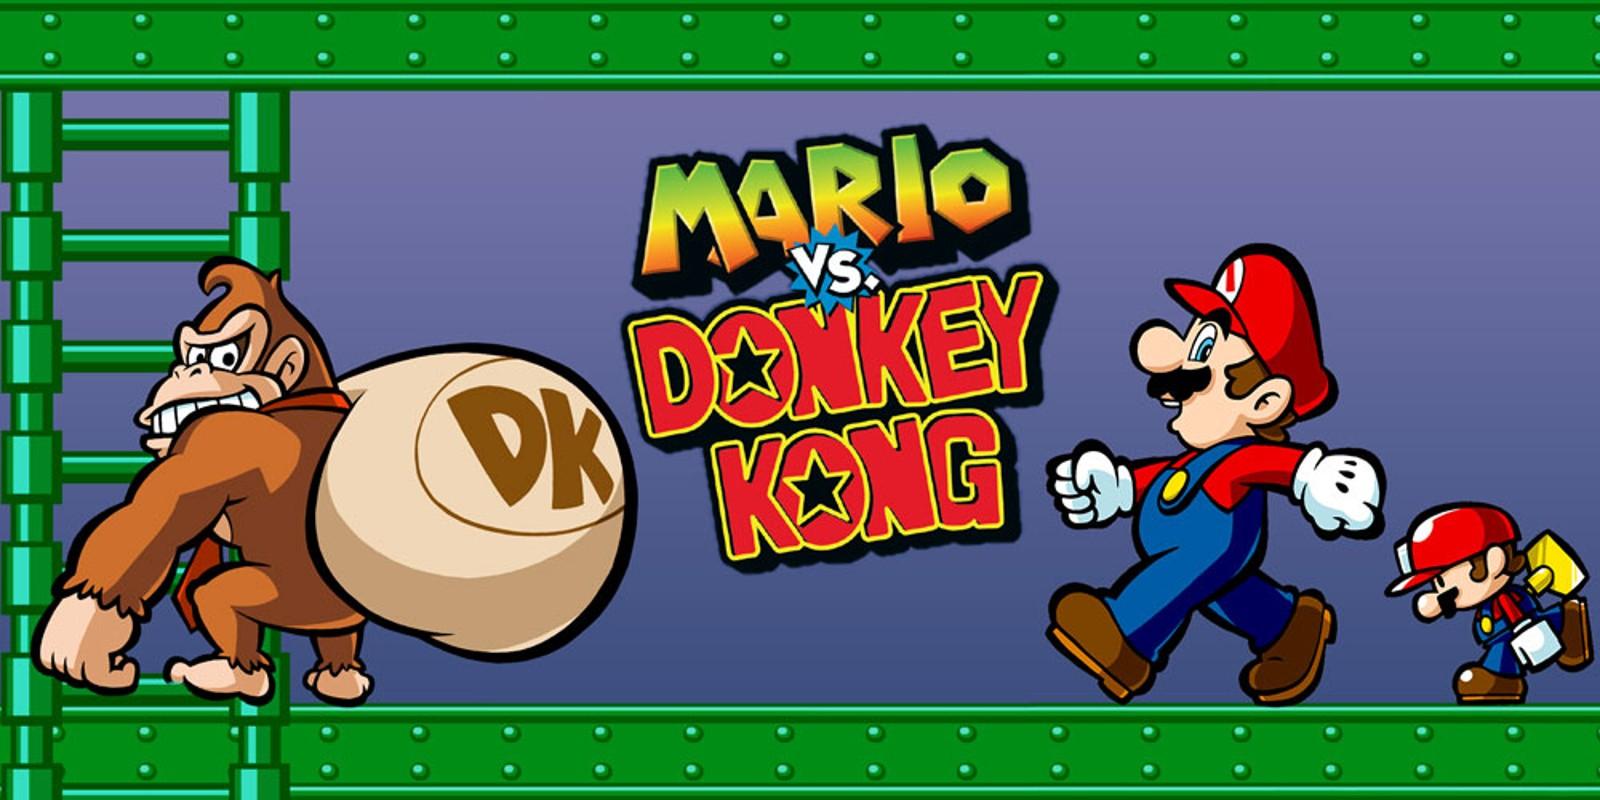 mario vs donkey kong game boy advance